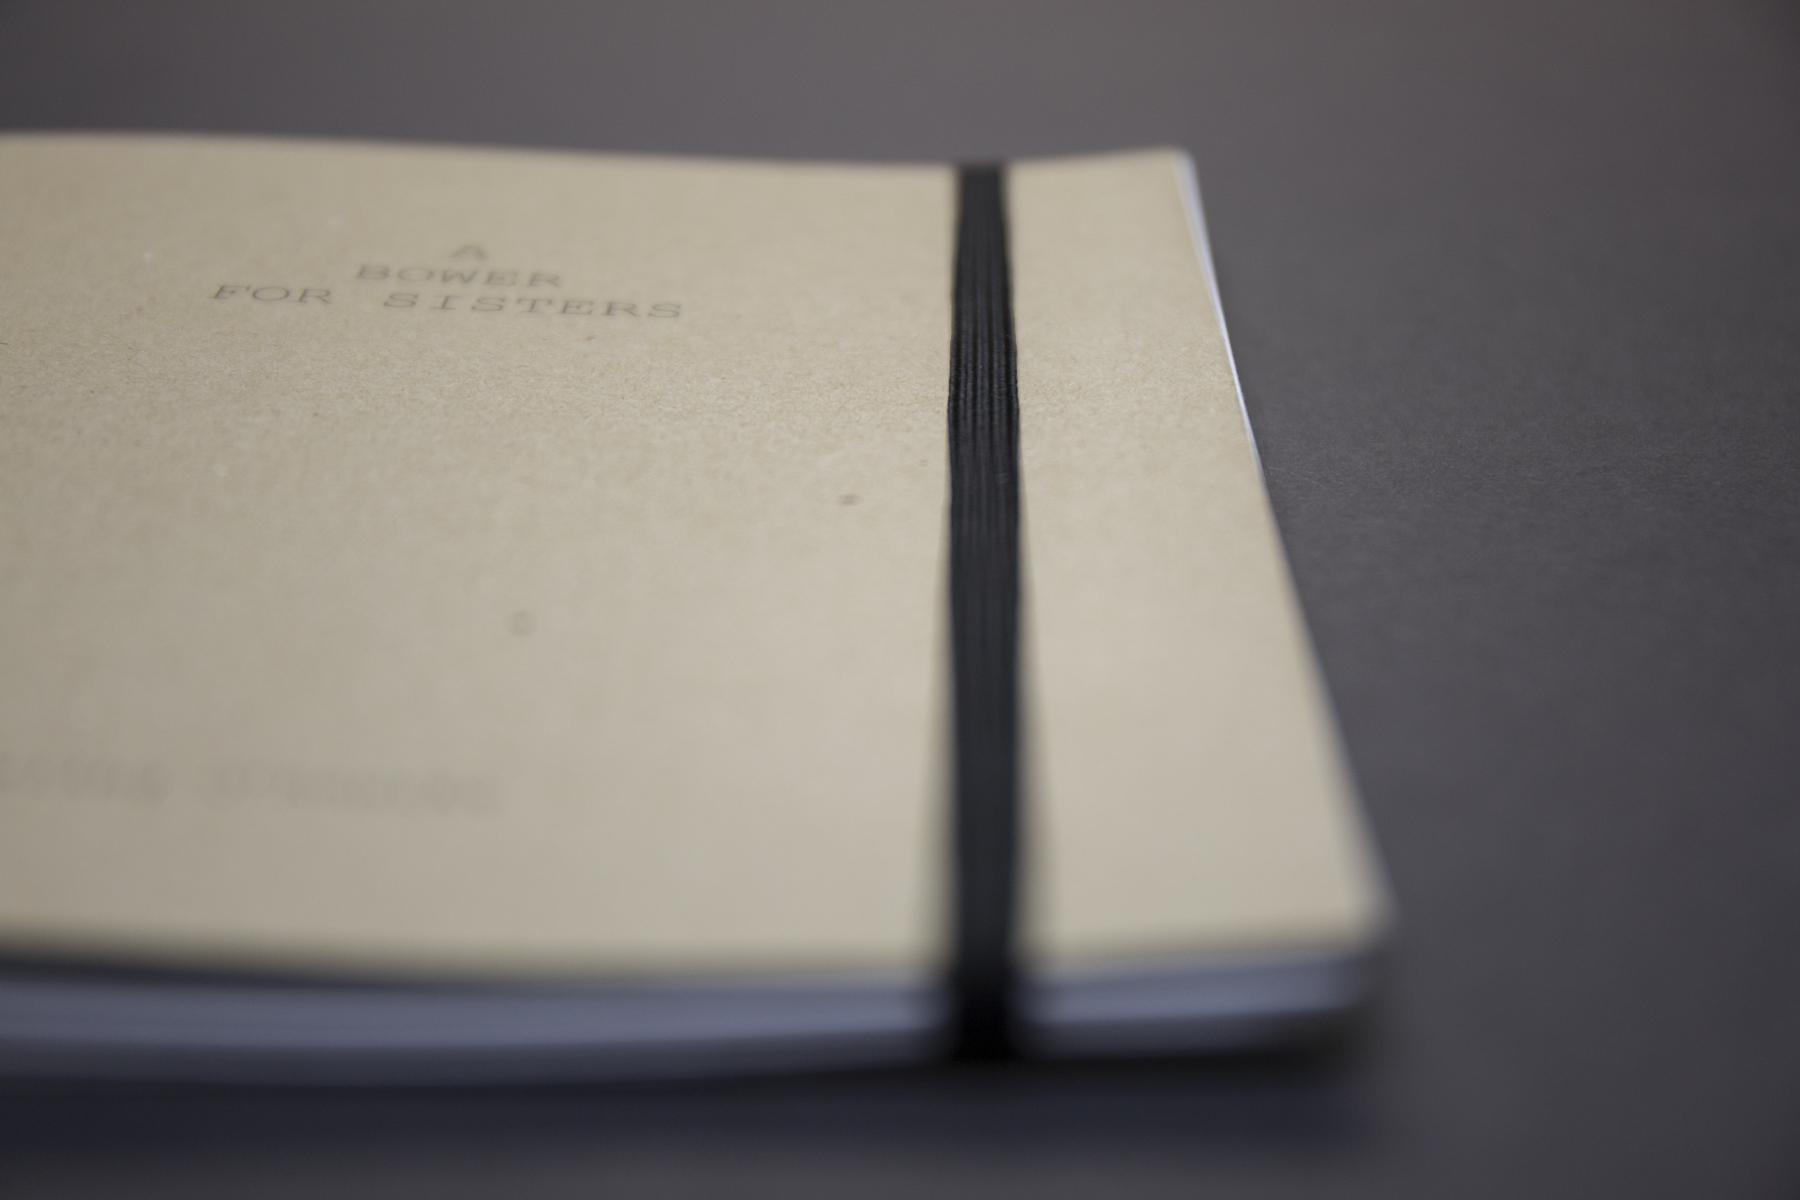 abowerforsisters-book-6.jpg